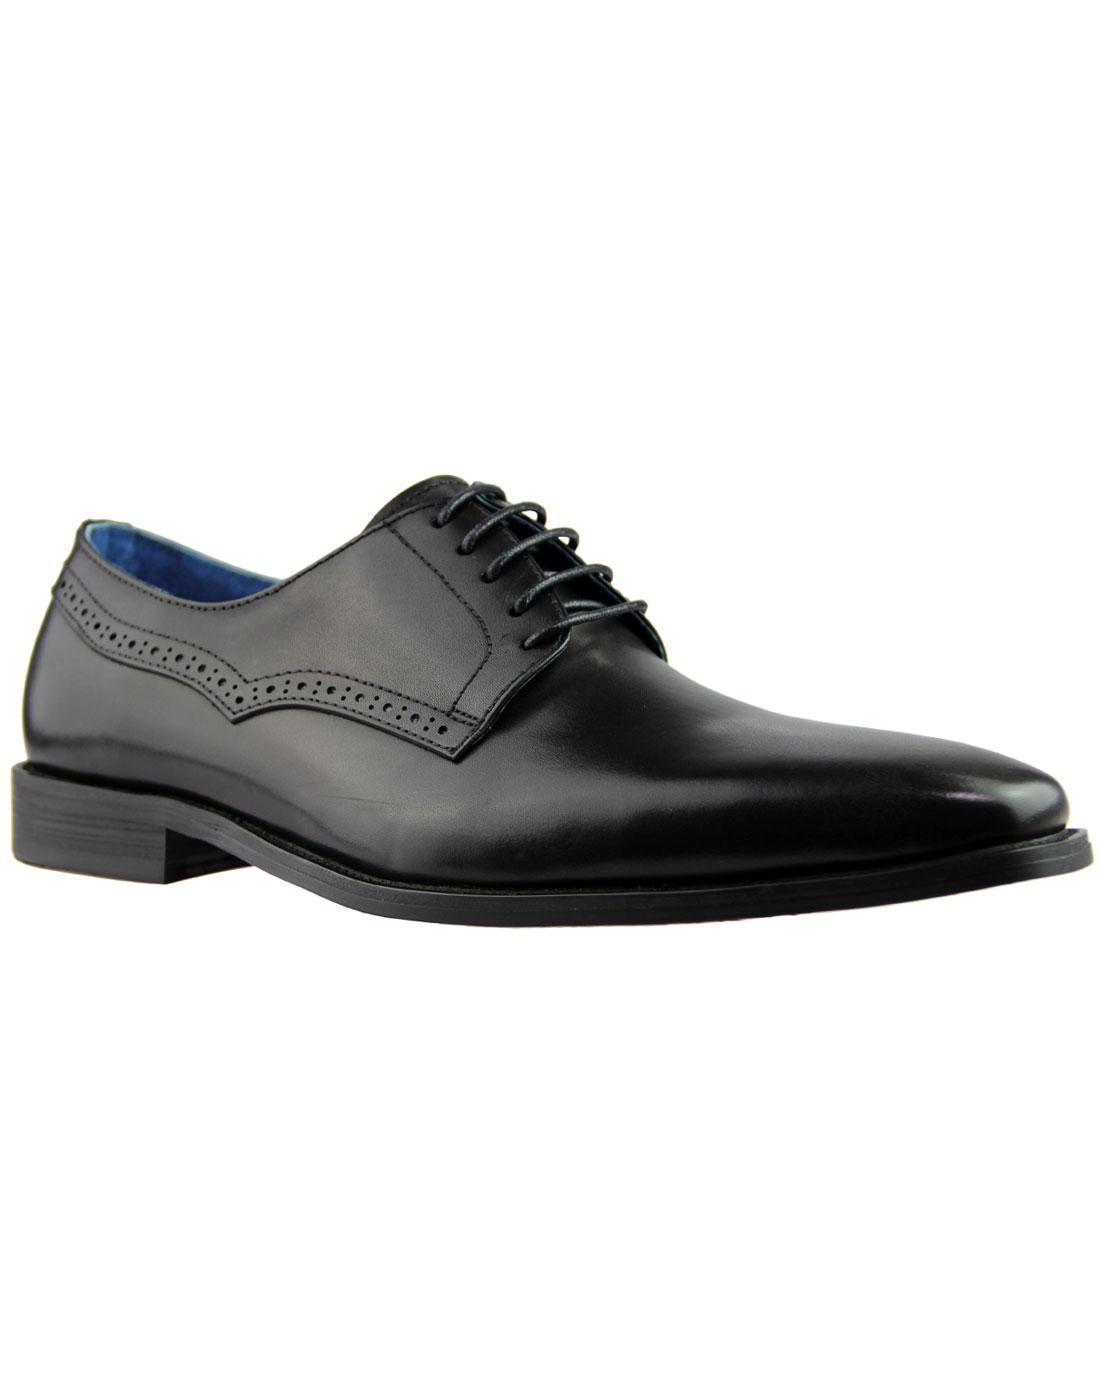 Ted PAOLO VANDINI Retro Mod Square Toe Dress Shoes